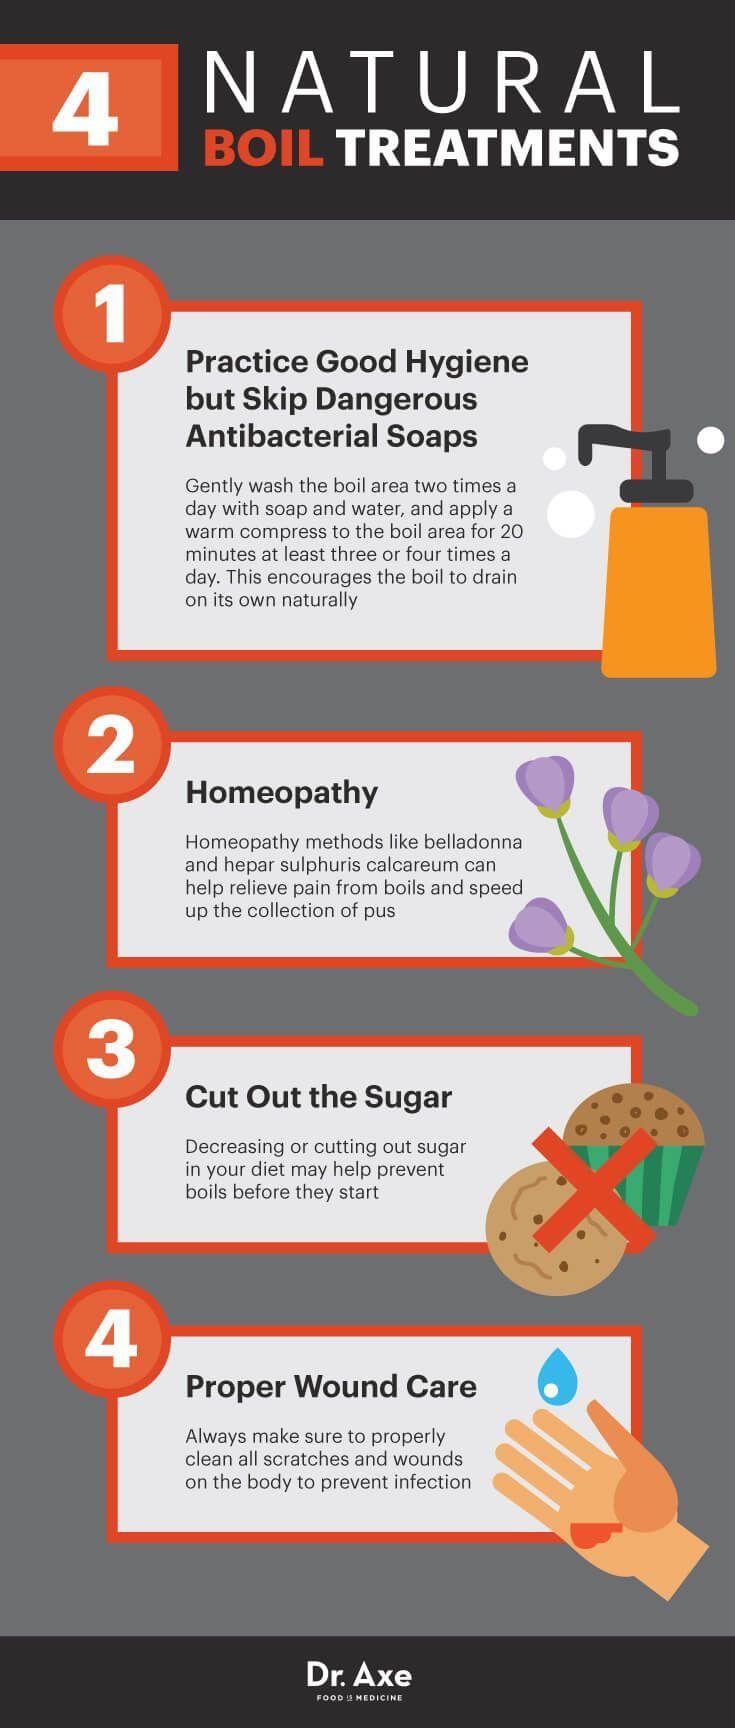 Four natural boil treatments - Dr. Axe  http://www.draxe.com #health #holistic #natural